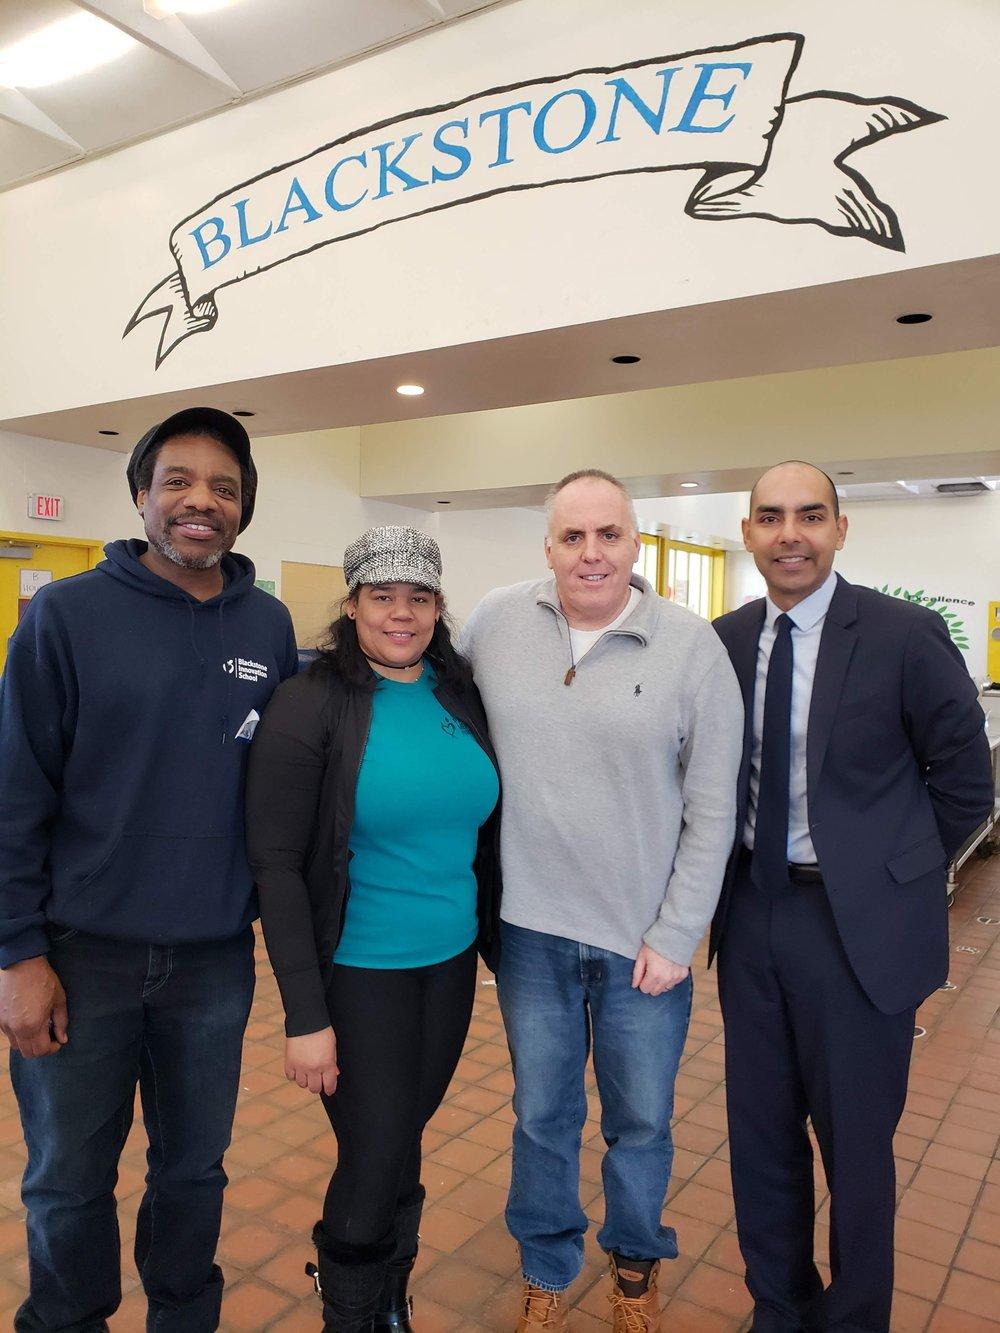 (L-R) Blackstone Principal Jamel Adkins-Sharif, SSYP Parent Organizer Rafaela Polanco, City Councilor Ed Flynn, State Rep. Jon Santiago